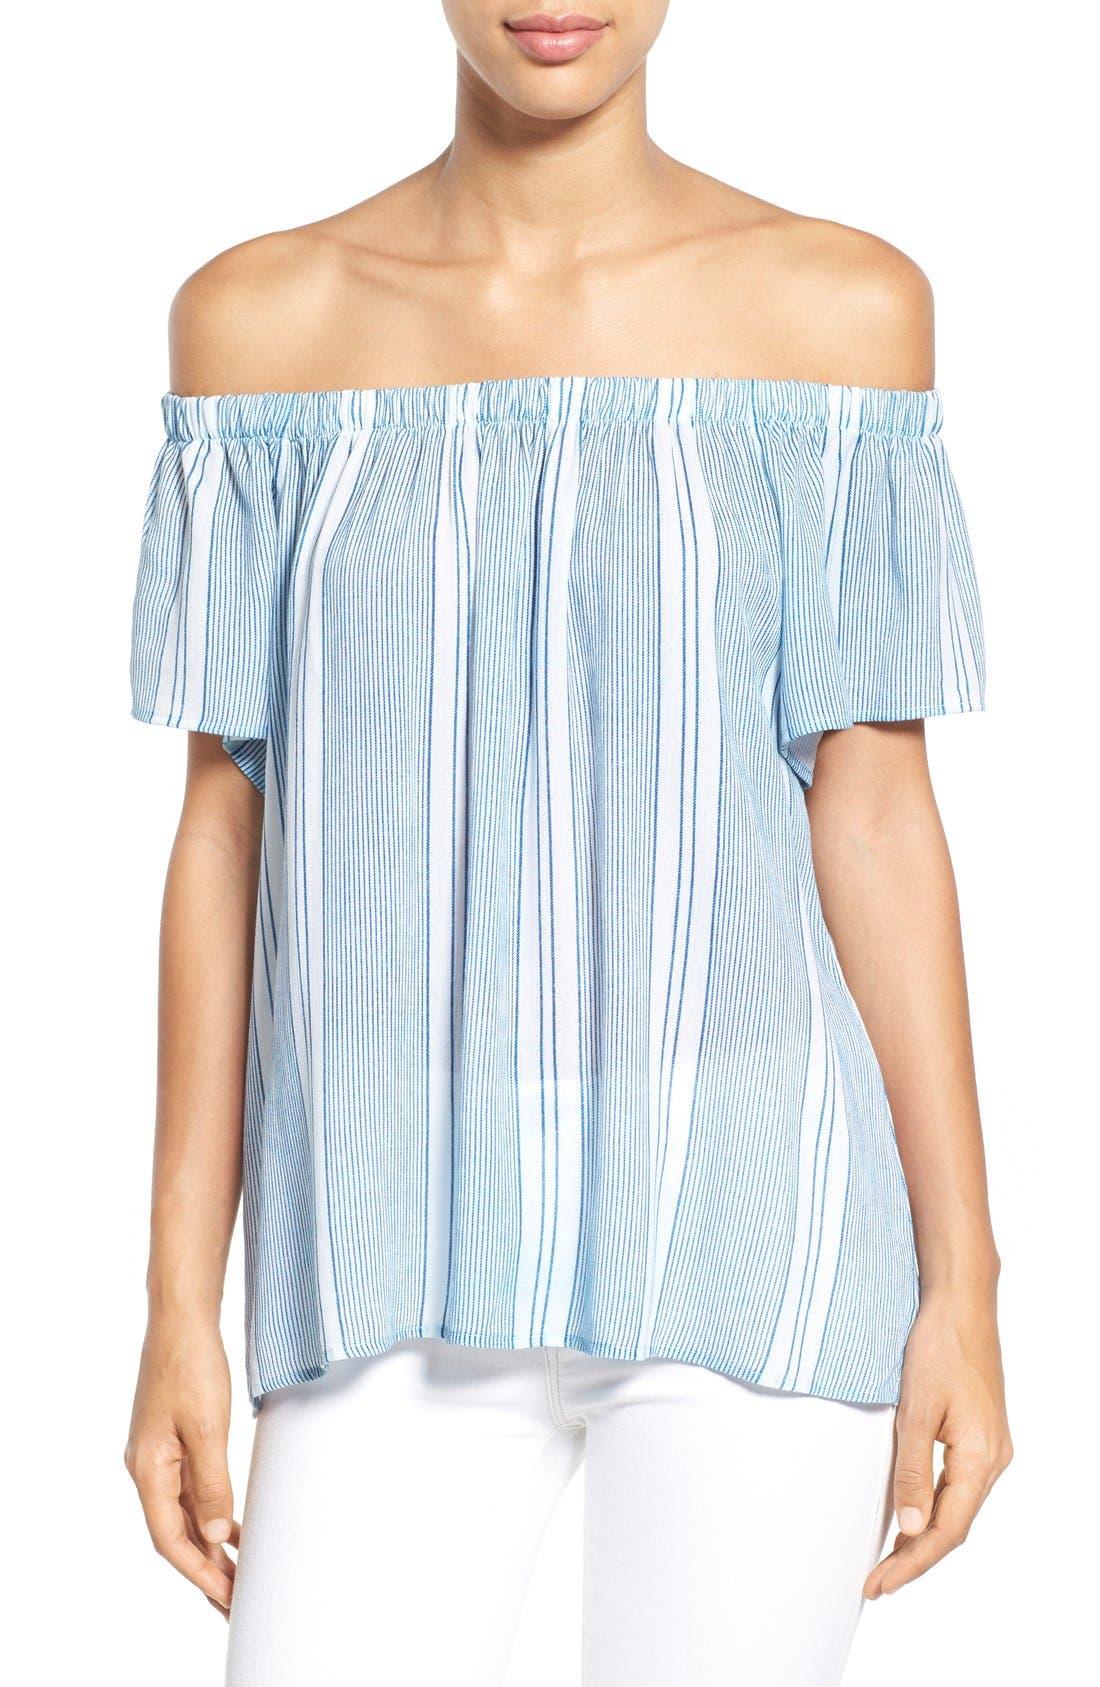 Off the Shoulder Top,                         Main,                         color, White/ Blue Stripe